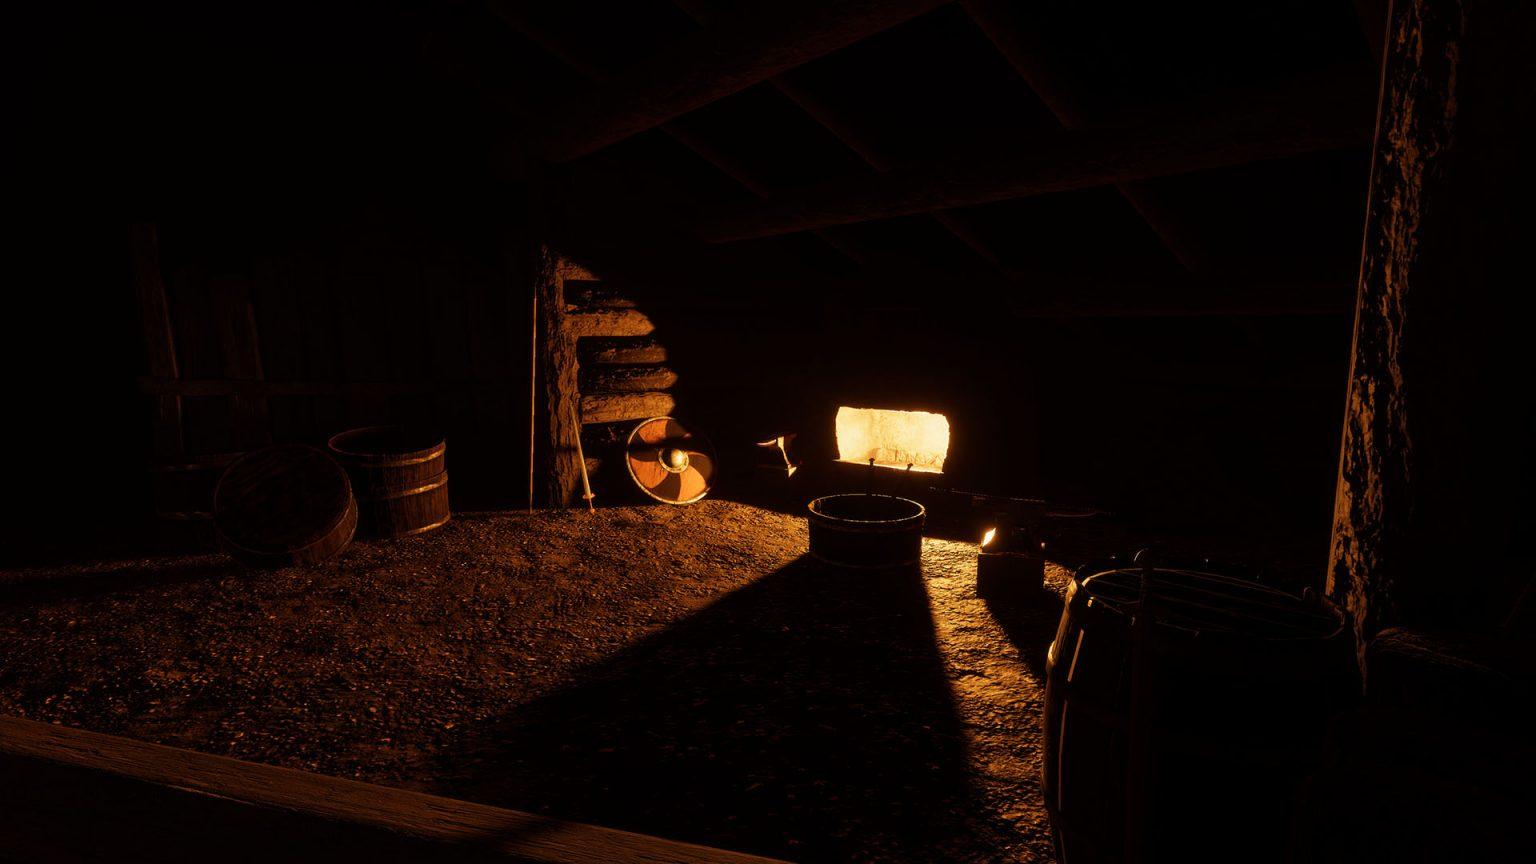 Darkest night at blacksmith